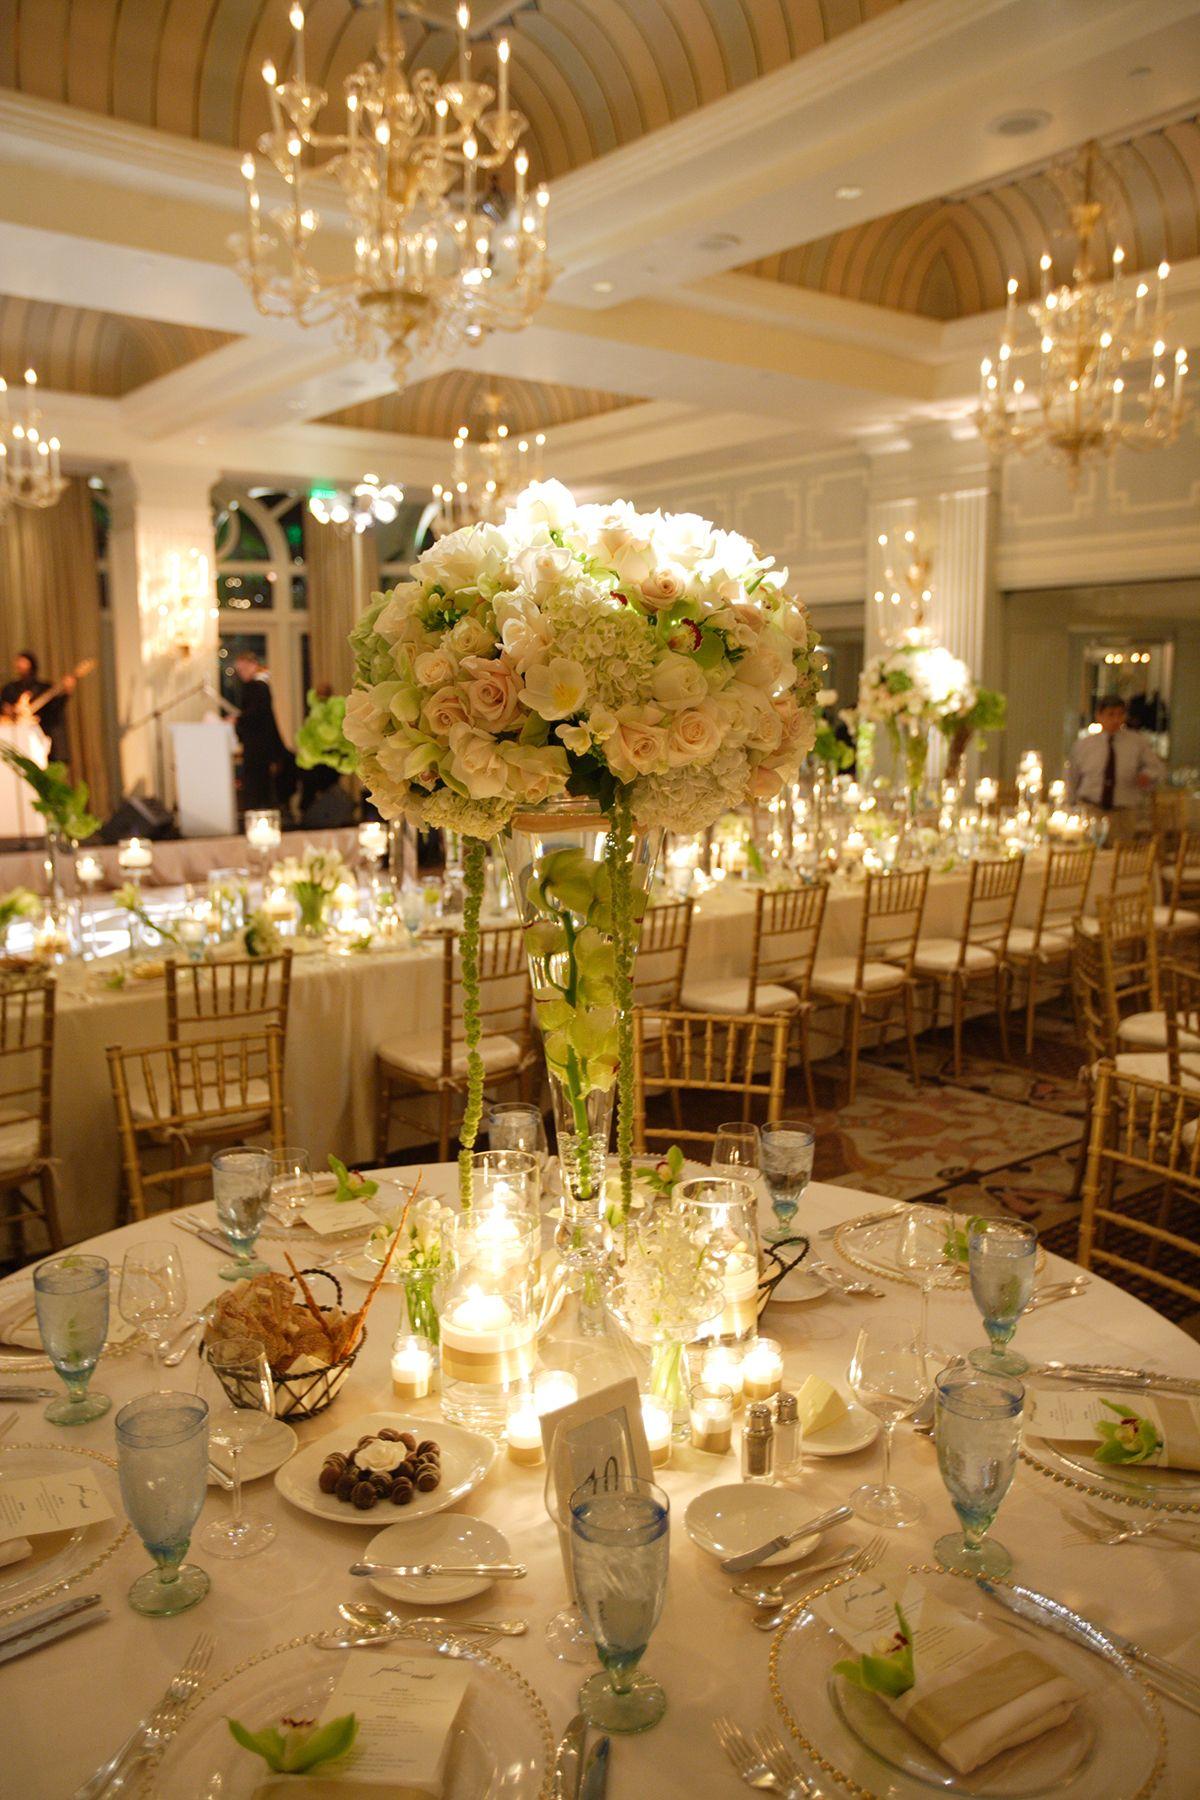 Beautiful wedding reception table setting. Colonnade